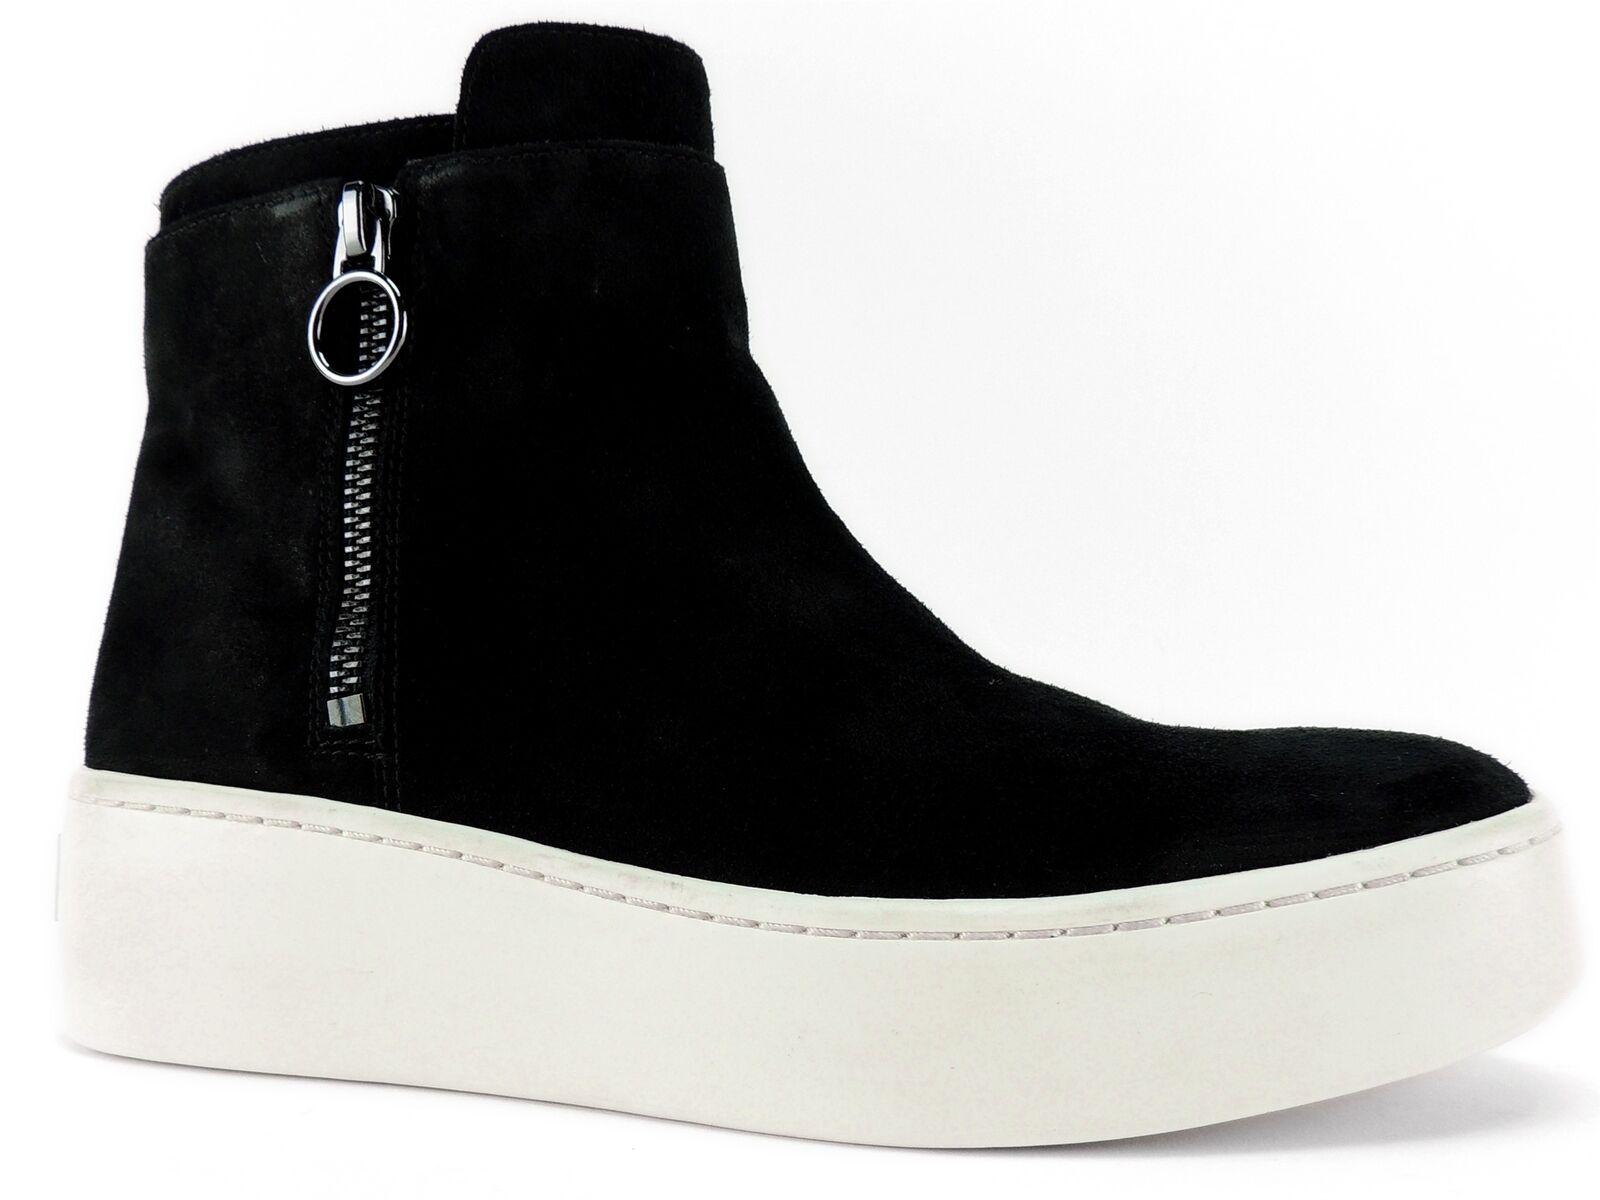 Via Spiga Women's Easton High Top Platform Sneakers Black Suede Size 5.5 M